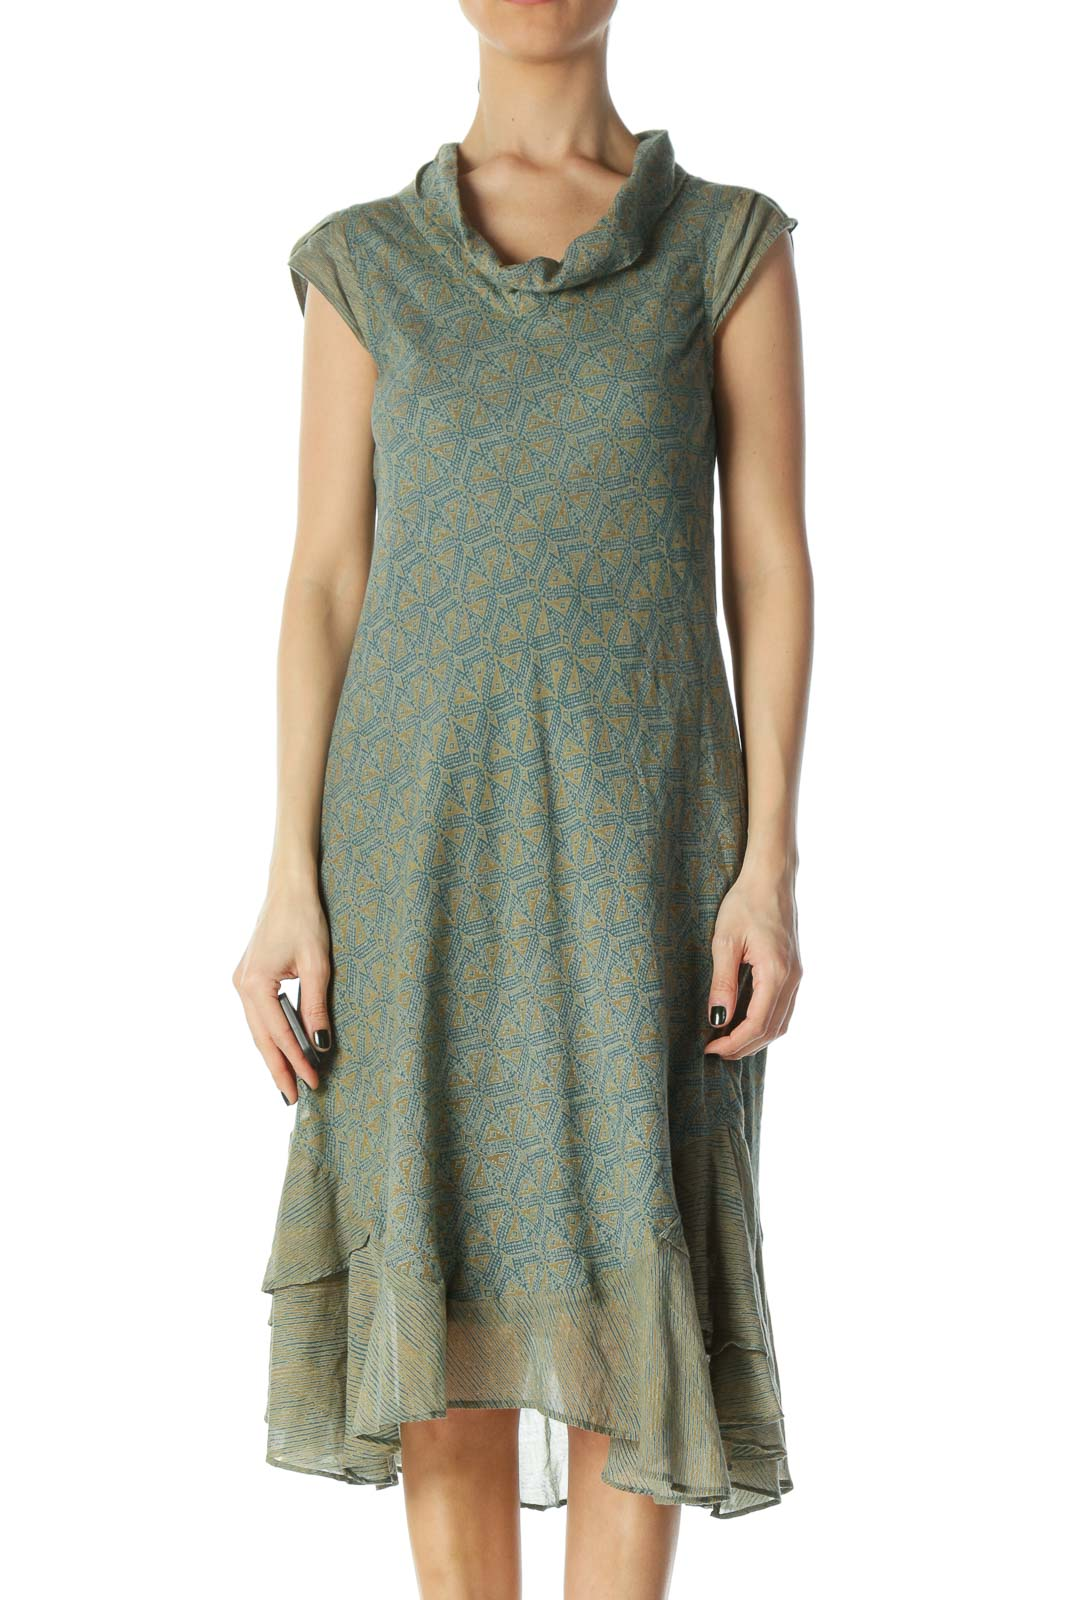 Blue and Gold Geometric Dayl Dress